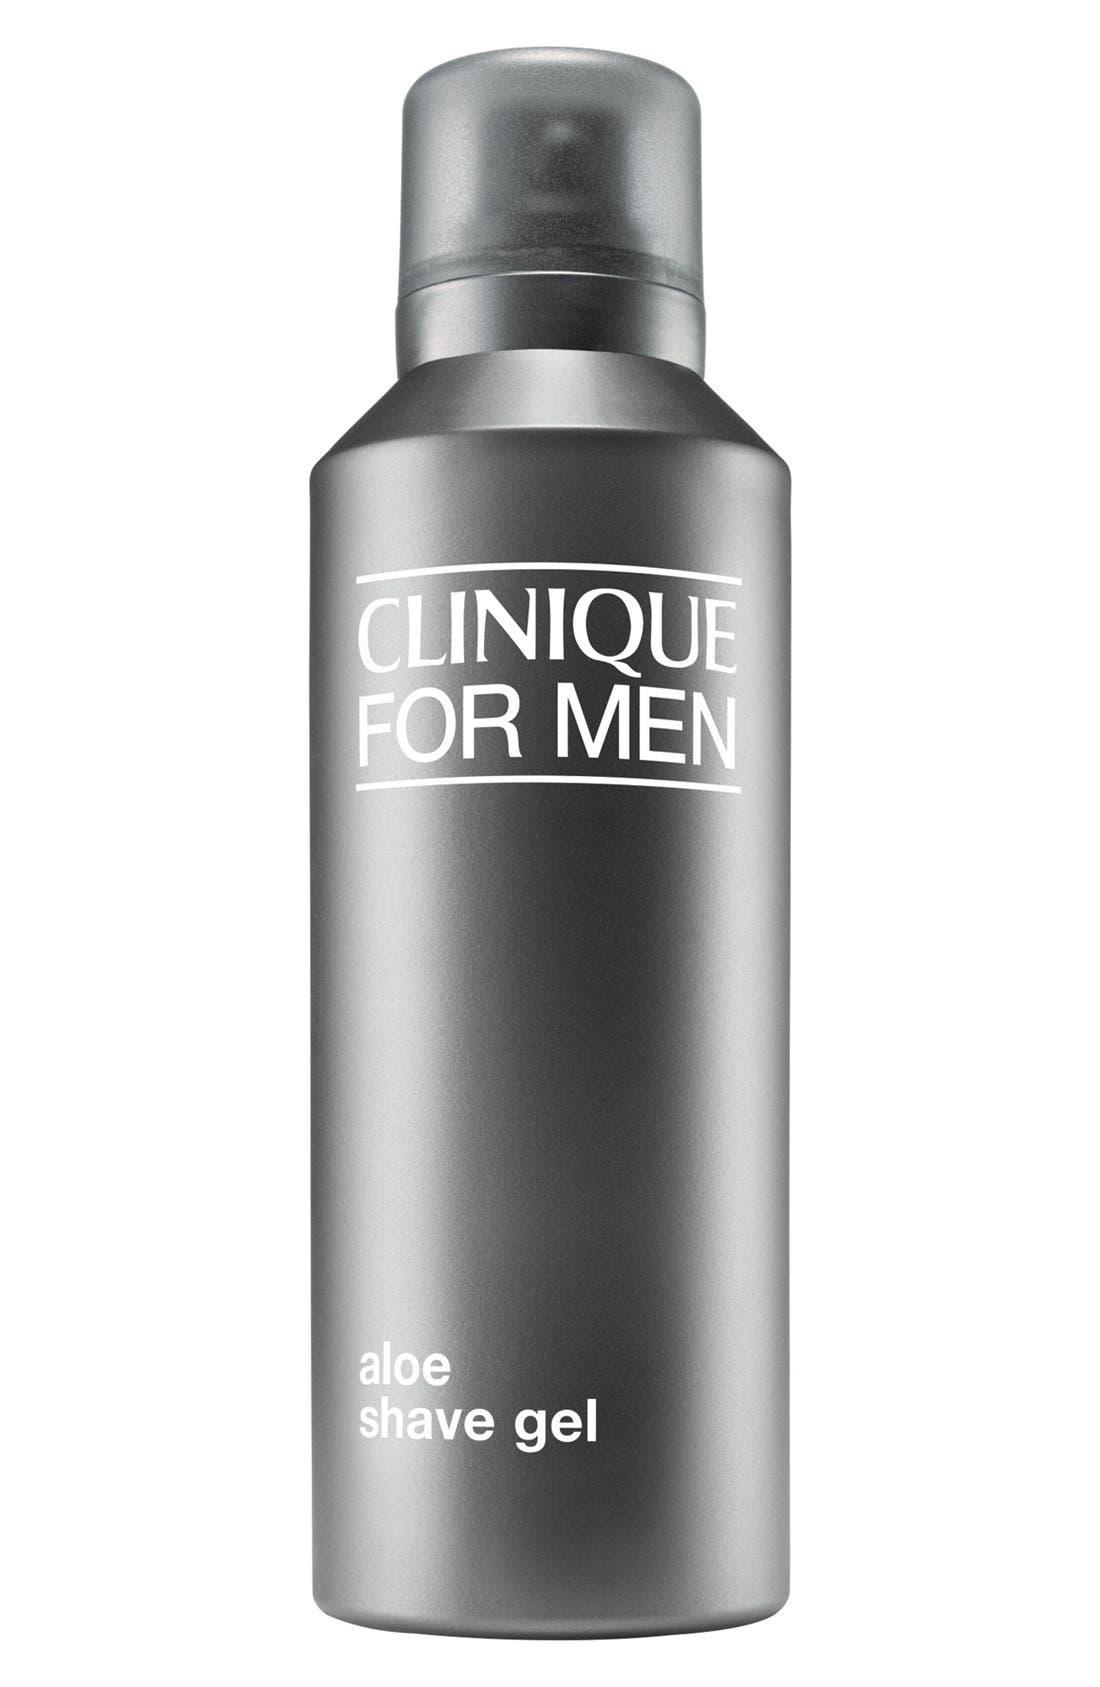 CLINIQUE for Men Aloe Shave Gel, Main, color, NO COLOR